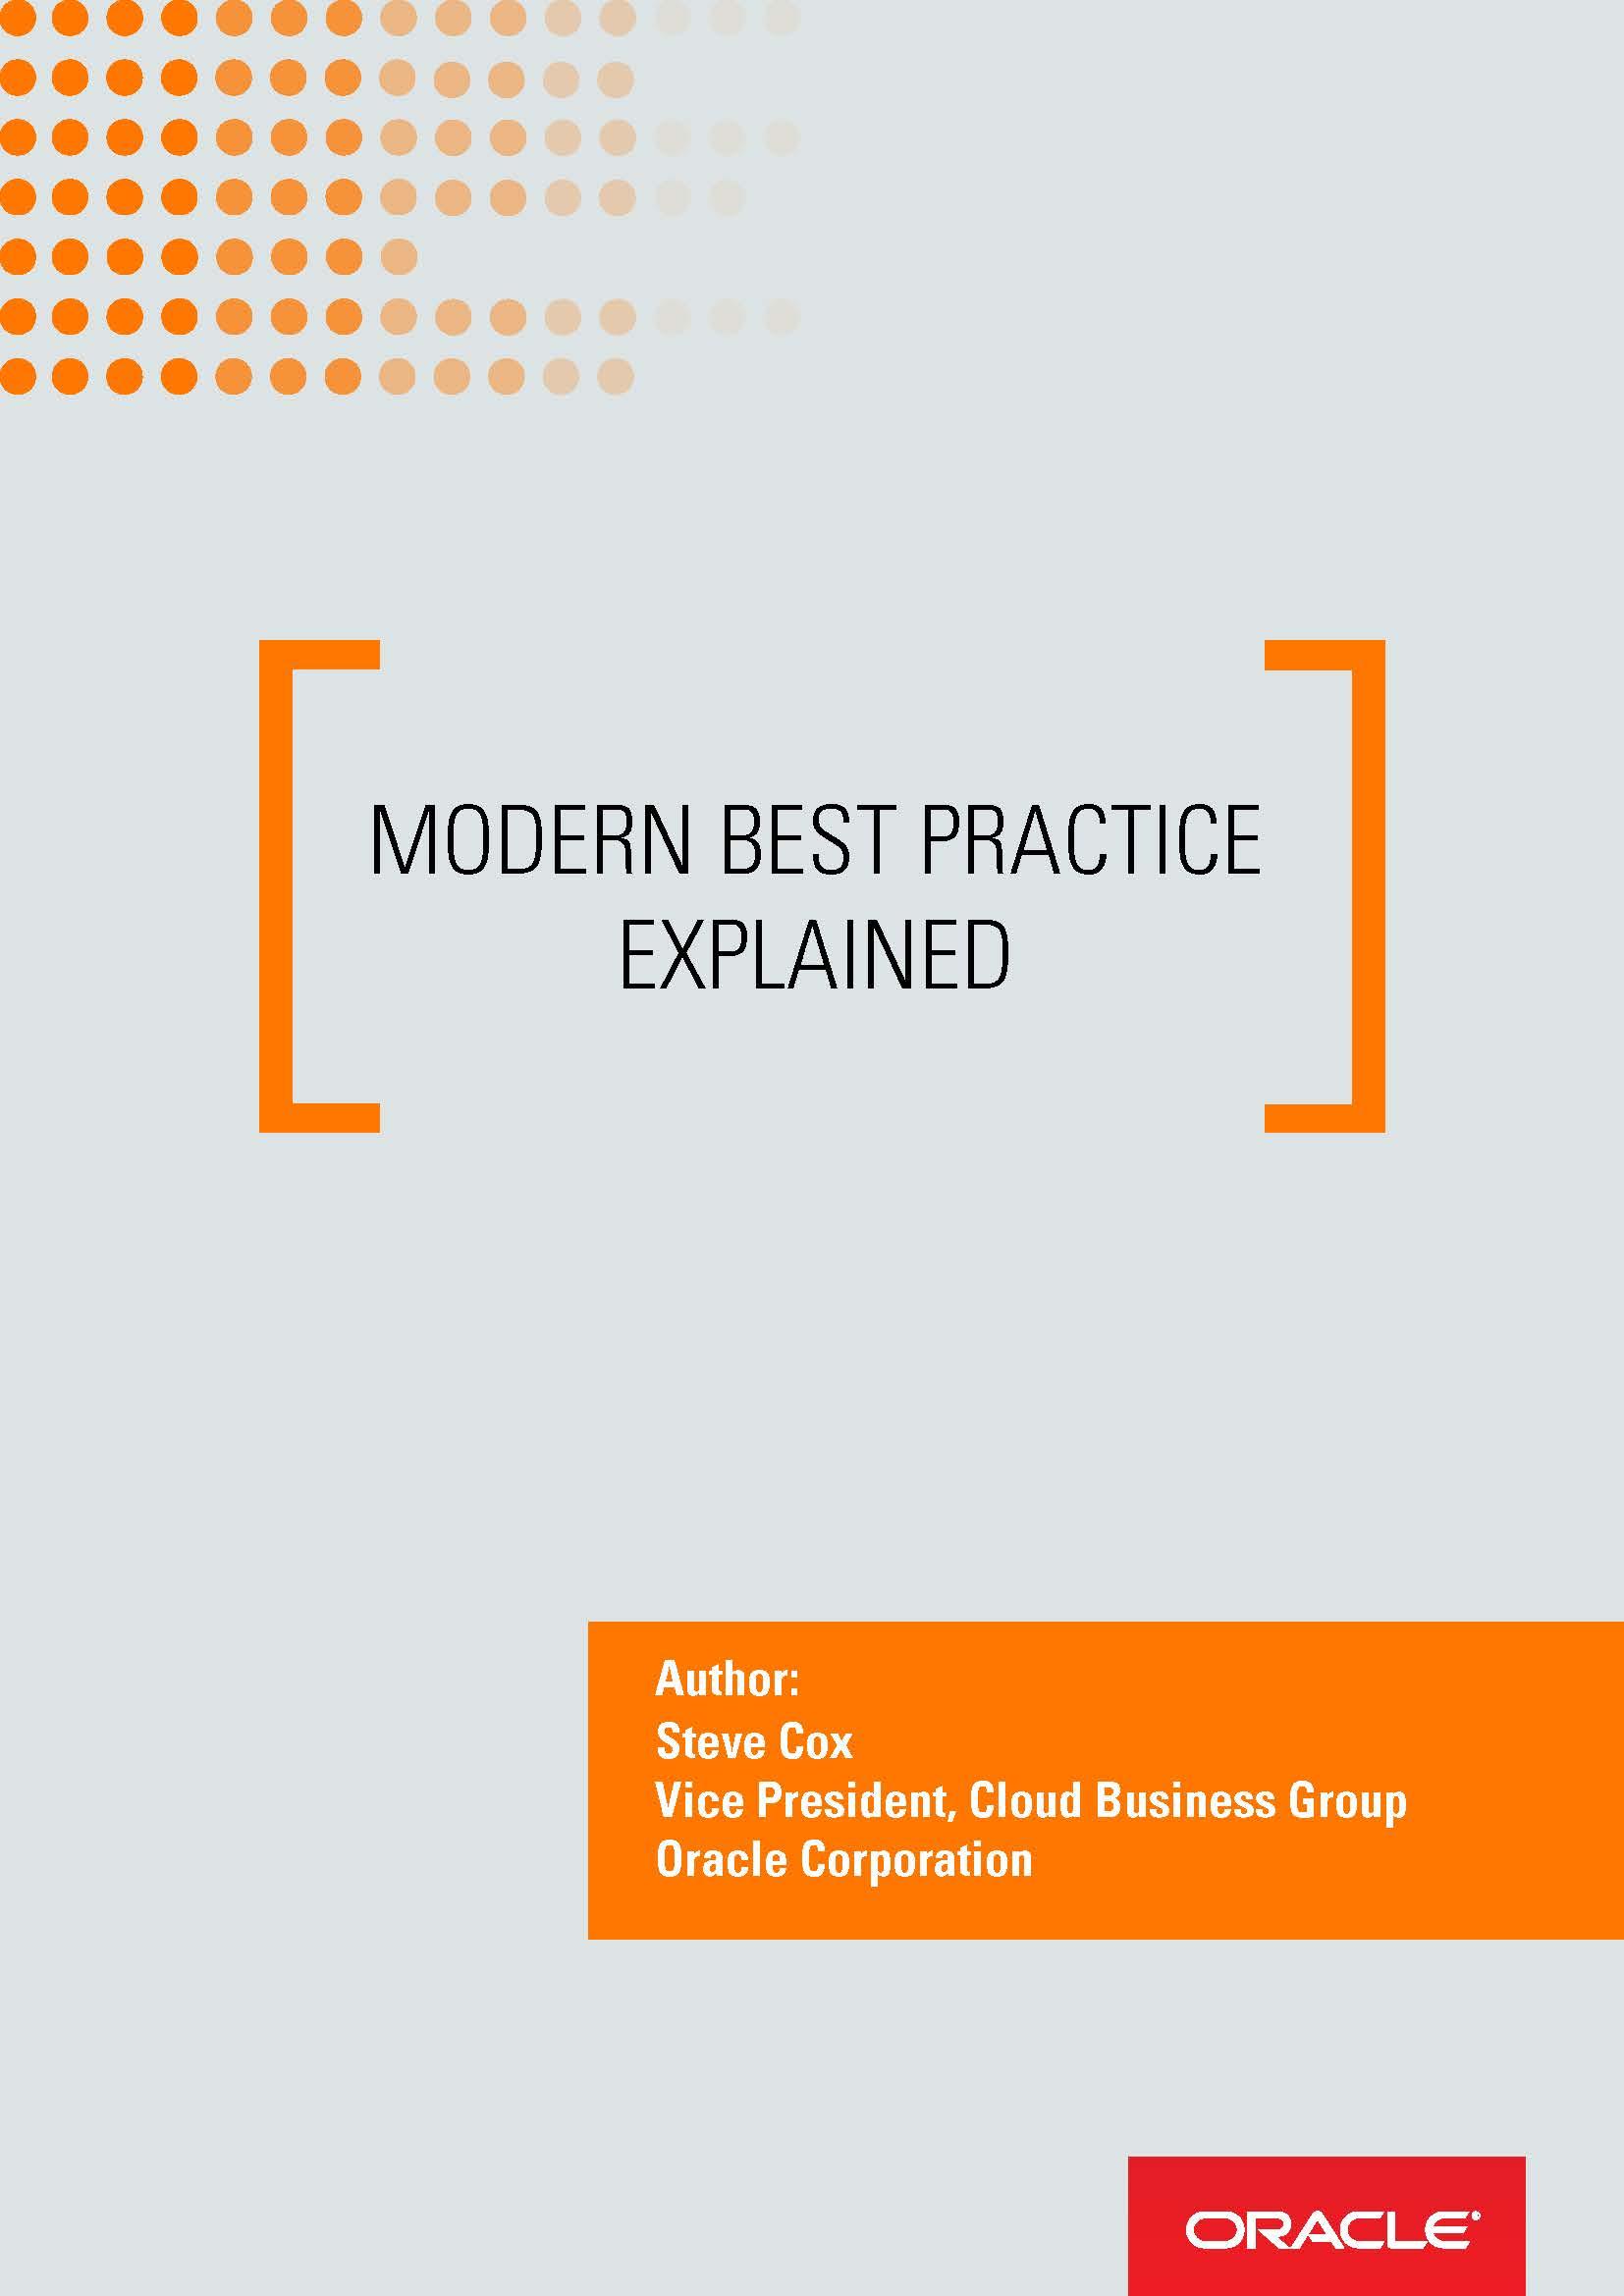 Modern Best Practice Explained